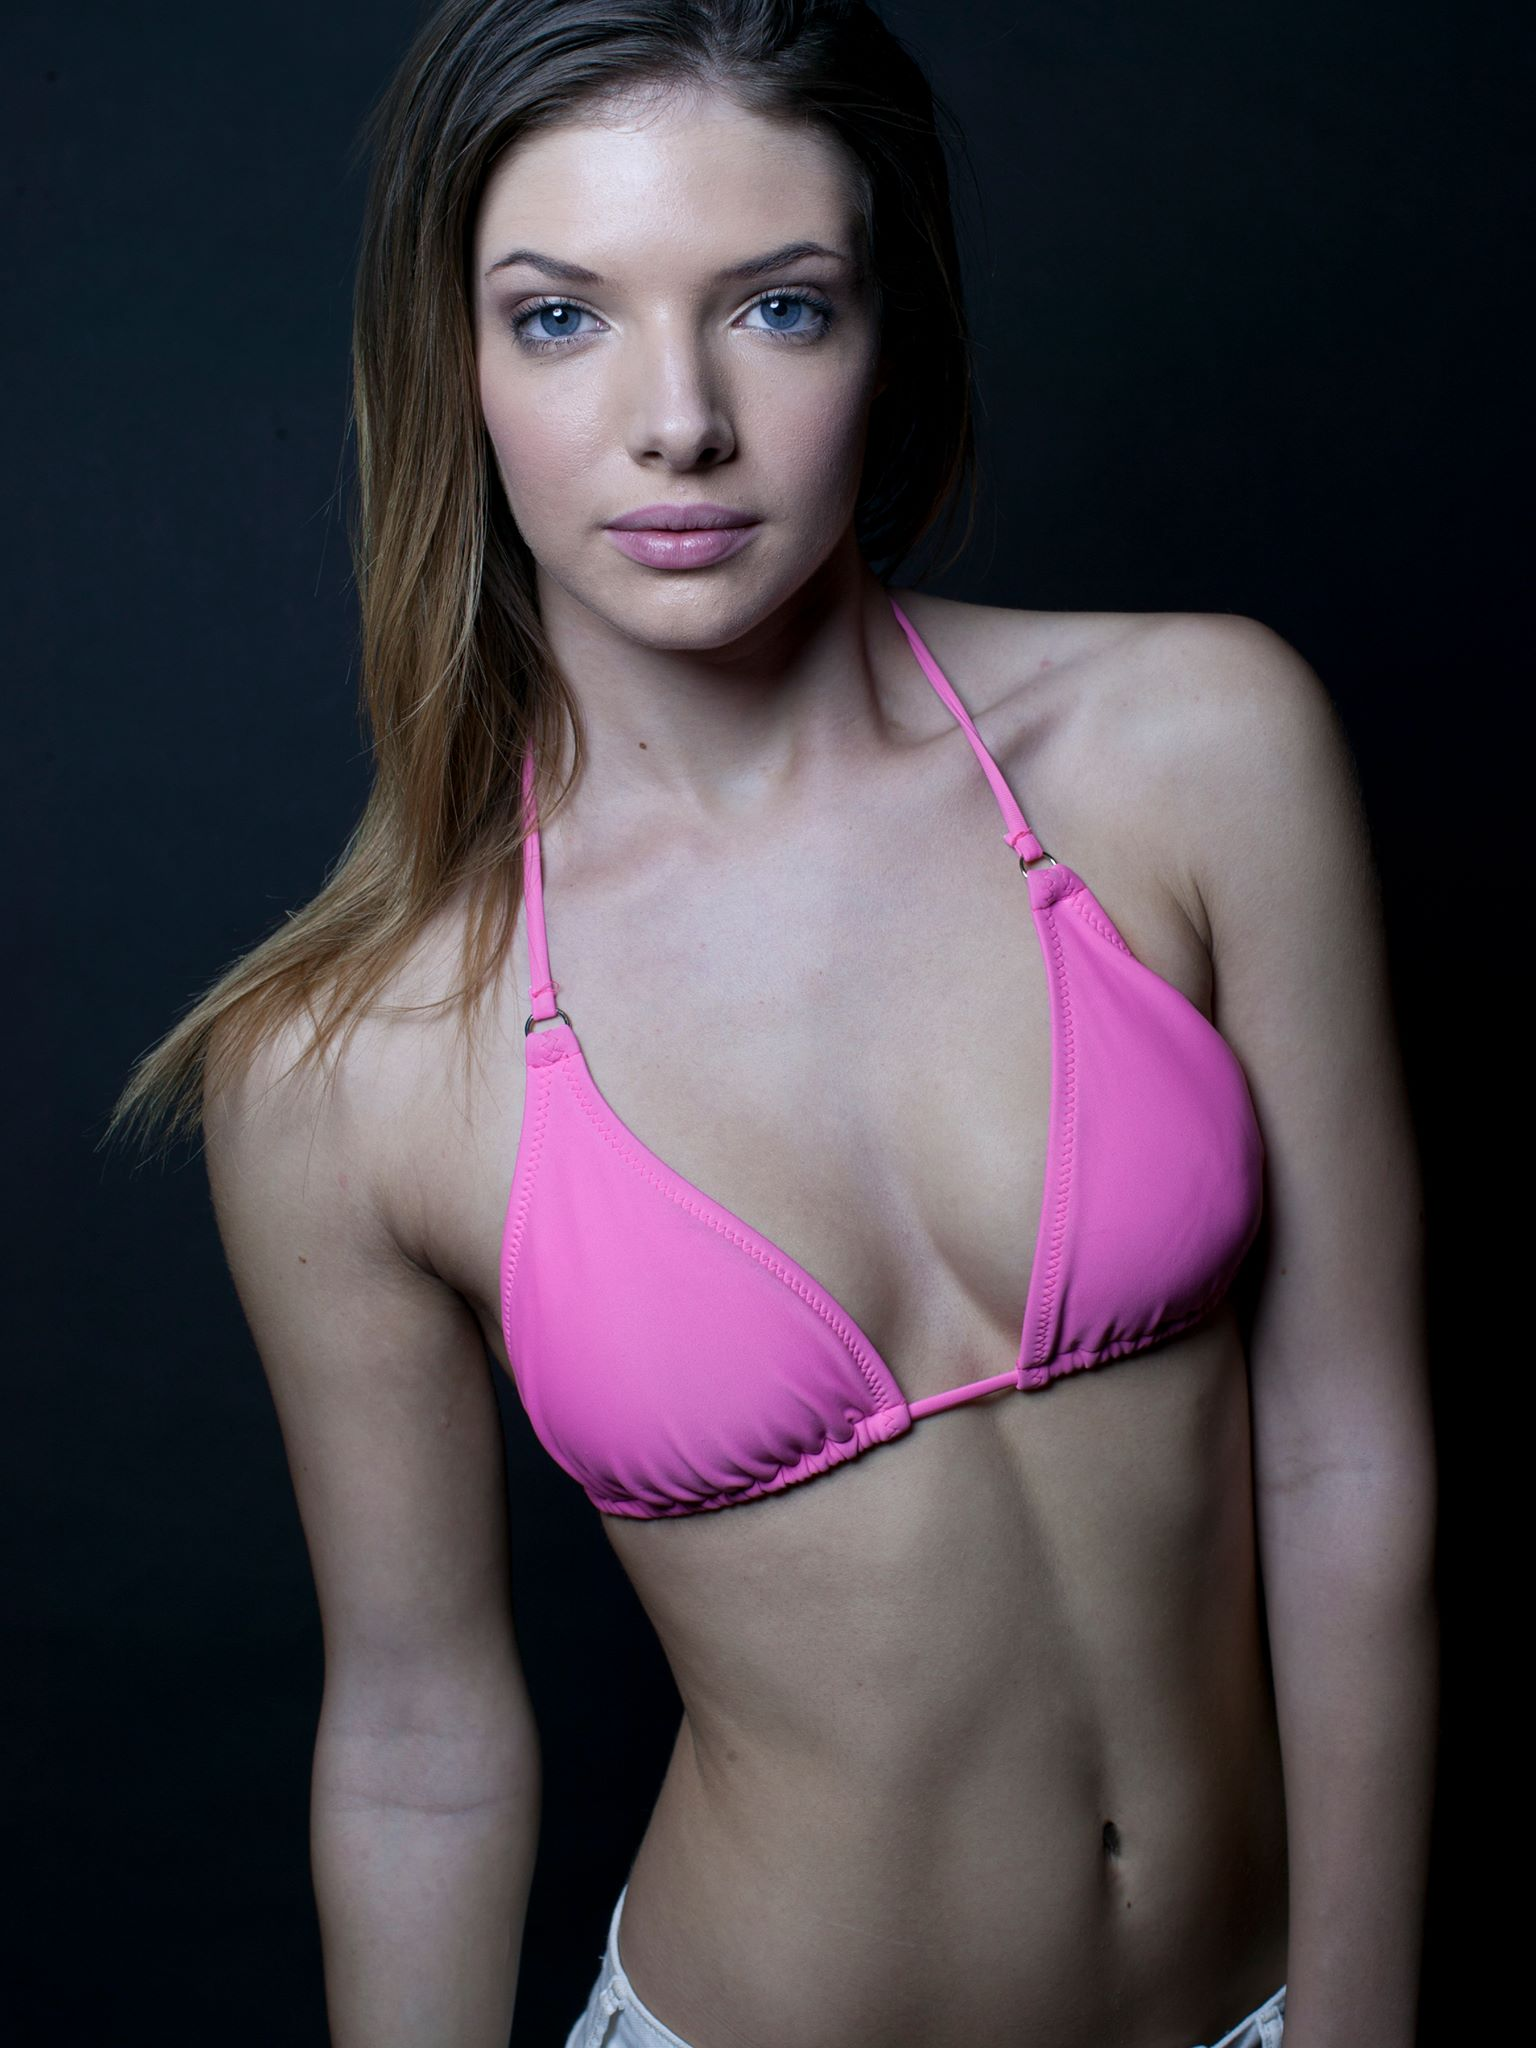 Ariel Eve Thompson in a bikini